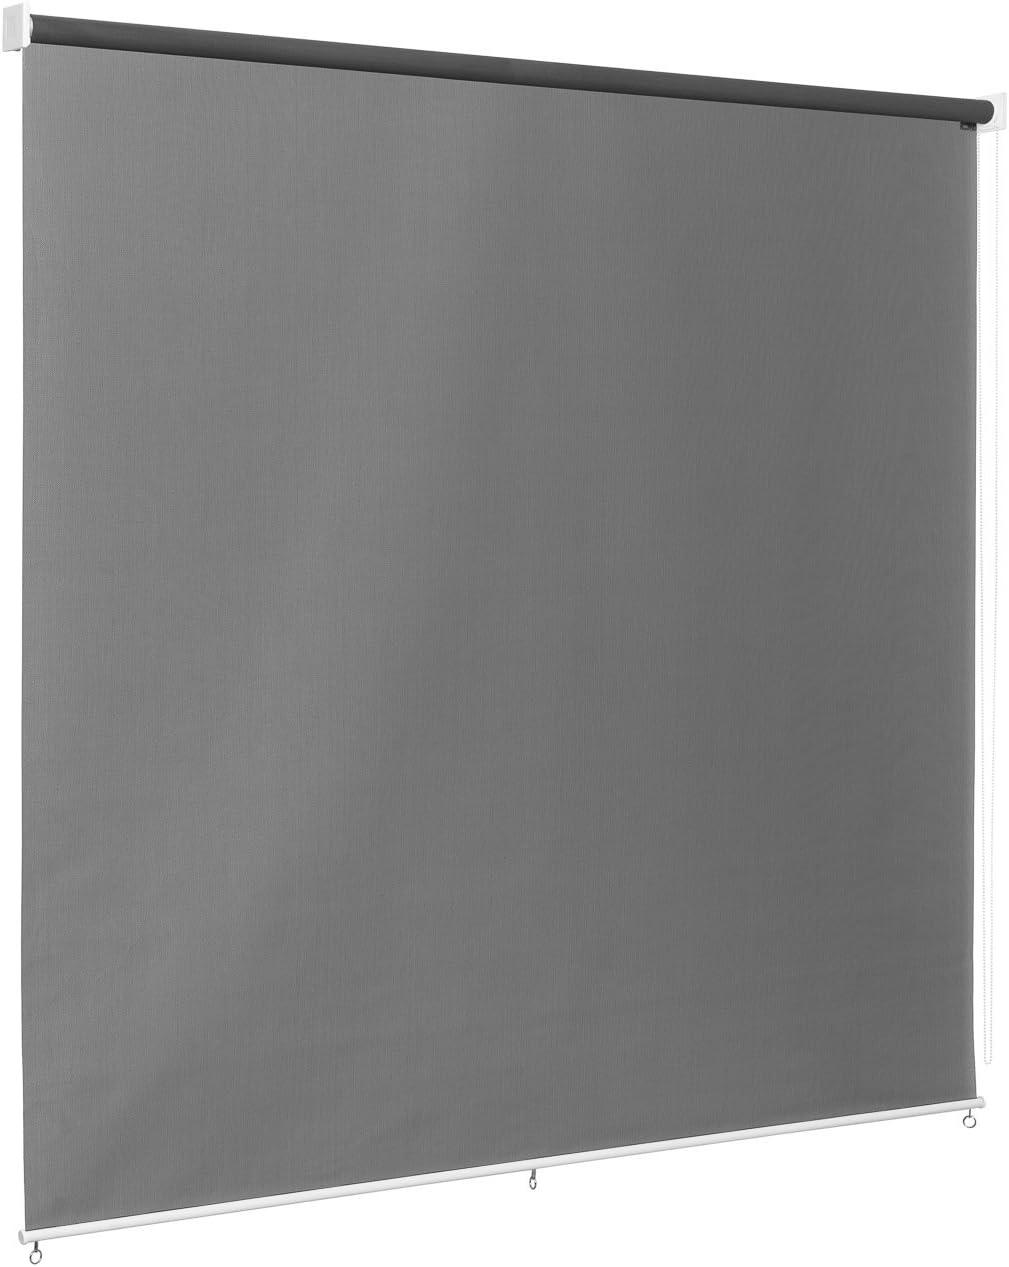 Ventanara Außenrollo Screen Rollo Senkrechtmarkise Balkonrollo Sichtschutz  Rollo Beschattung 20 x 20 cm Anthrazit